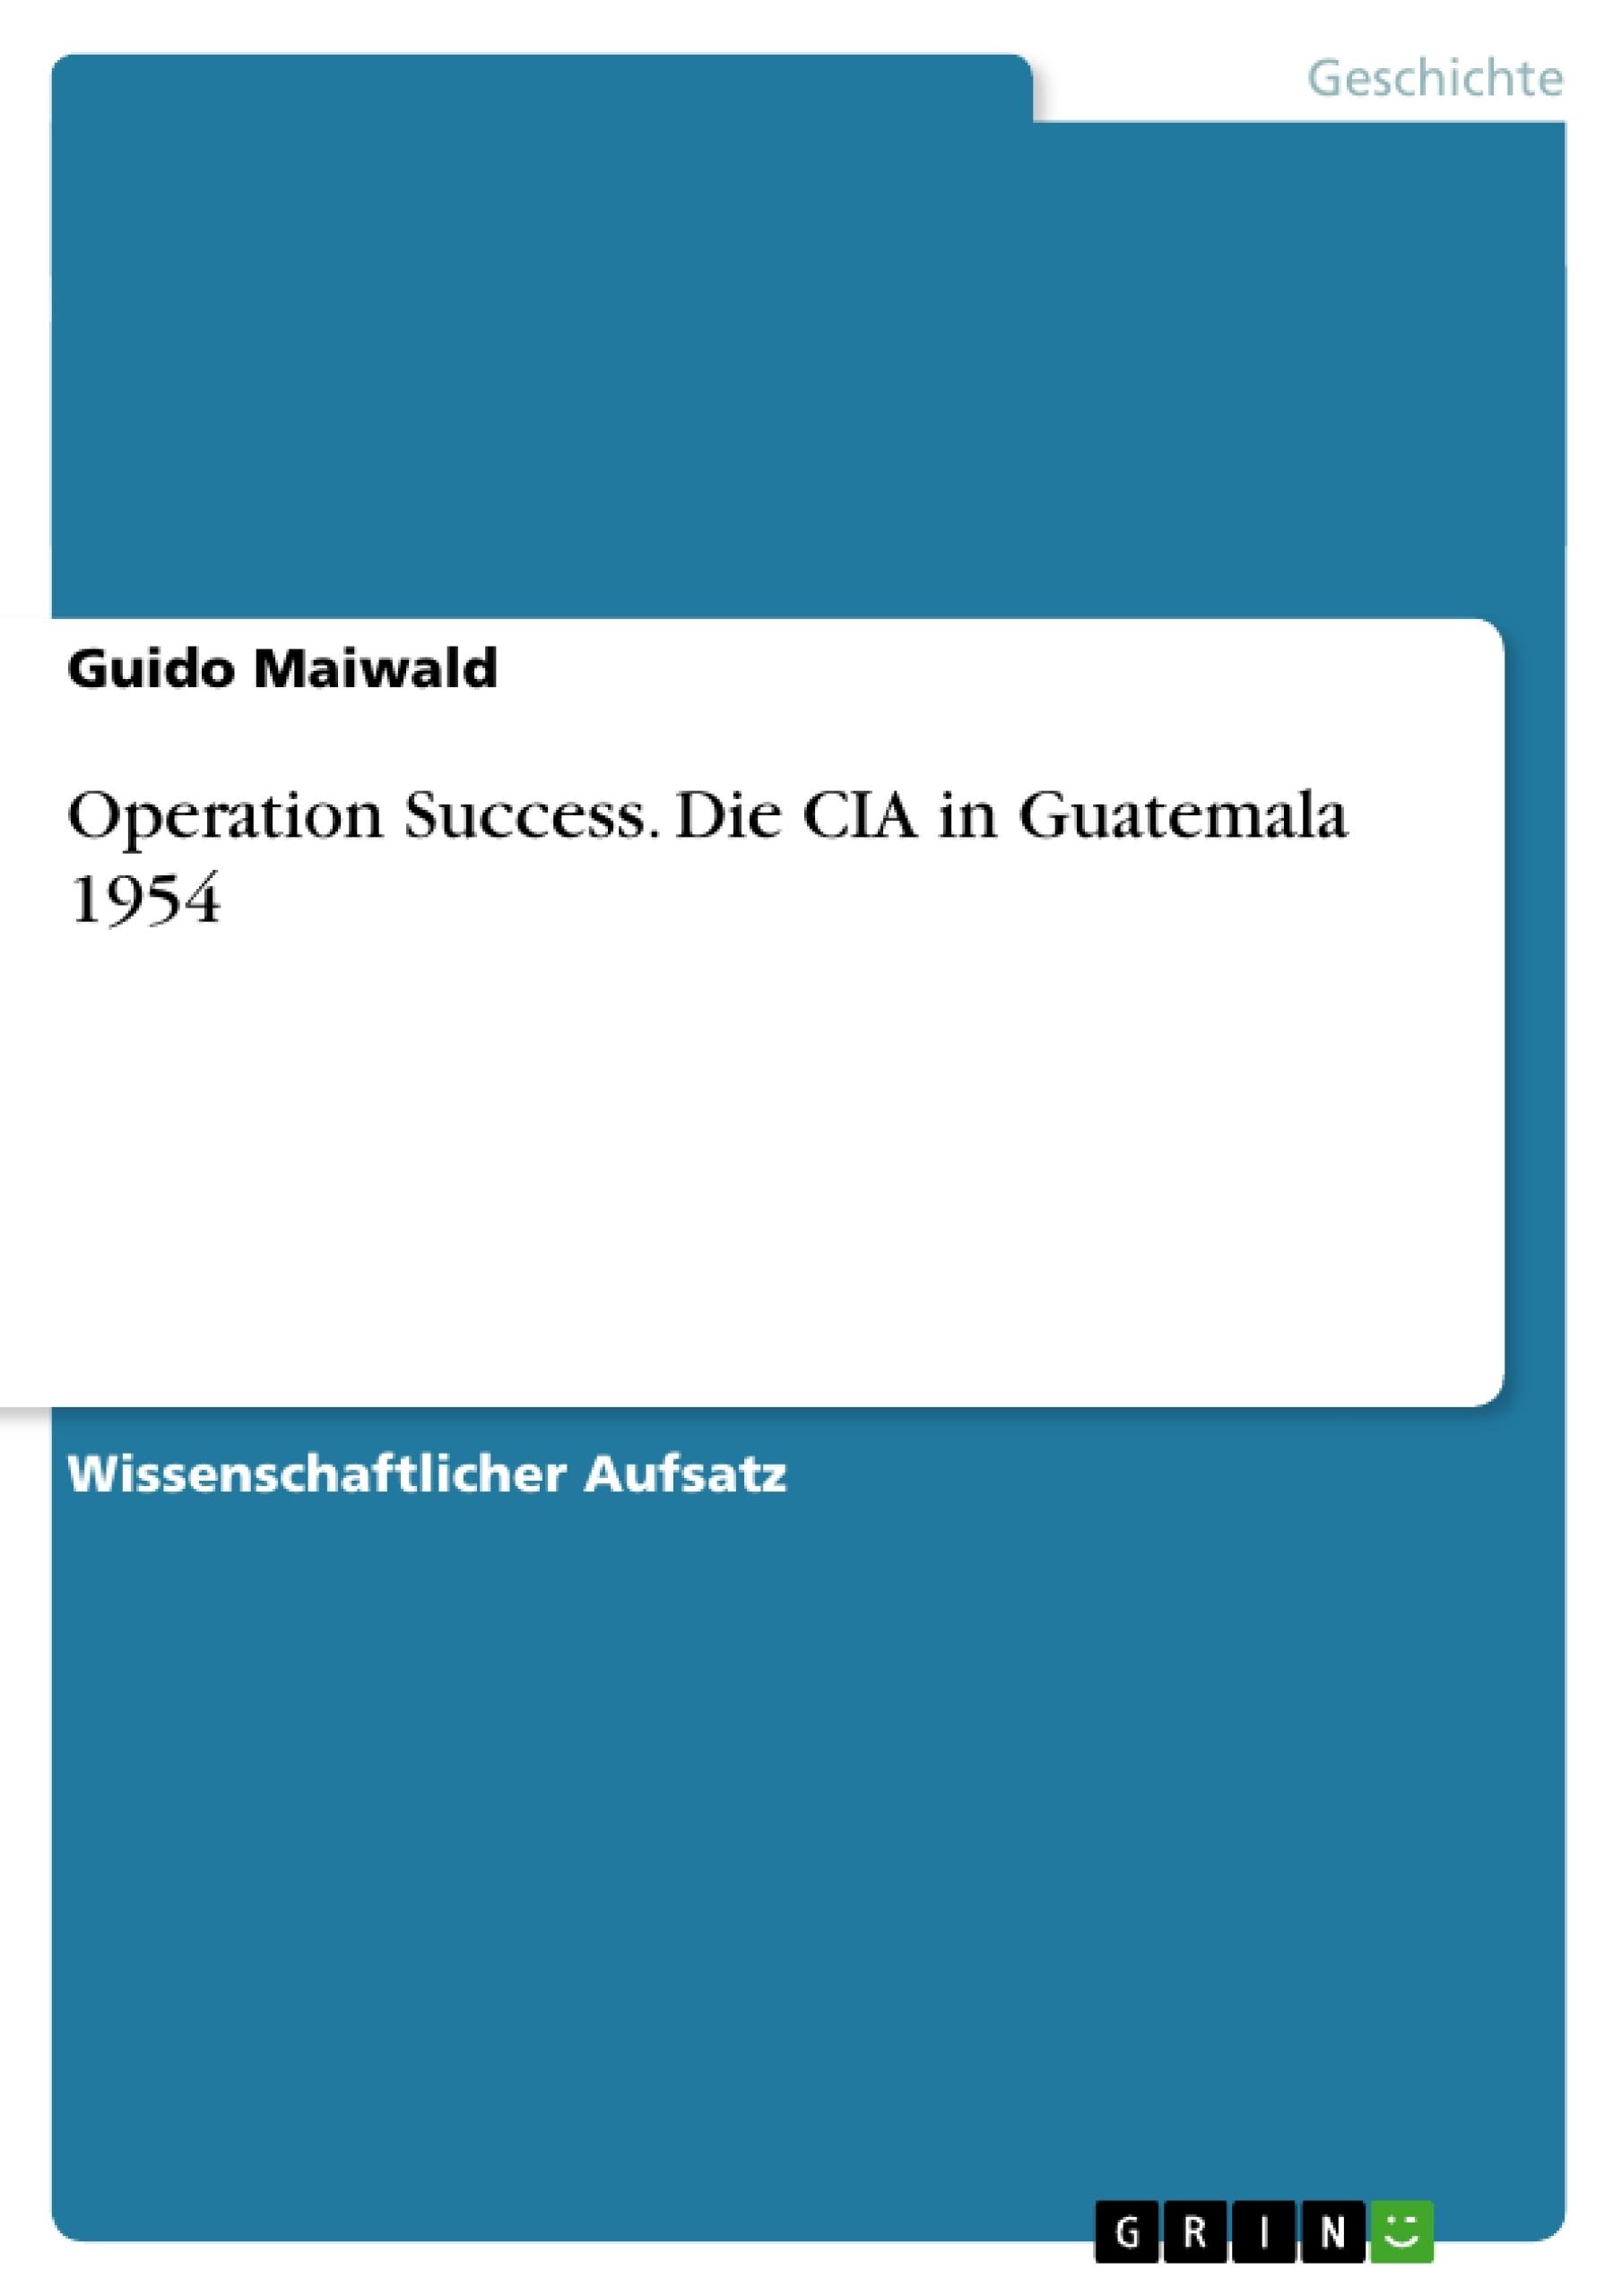 Titel: Operation Success. Die CIA in Guatemala 1954